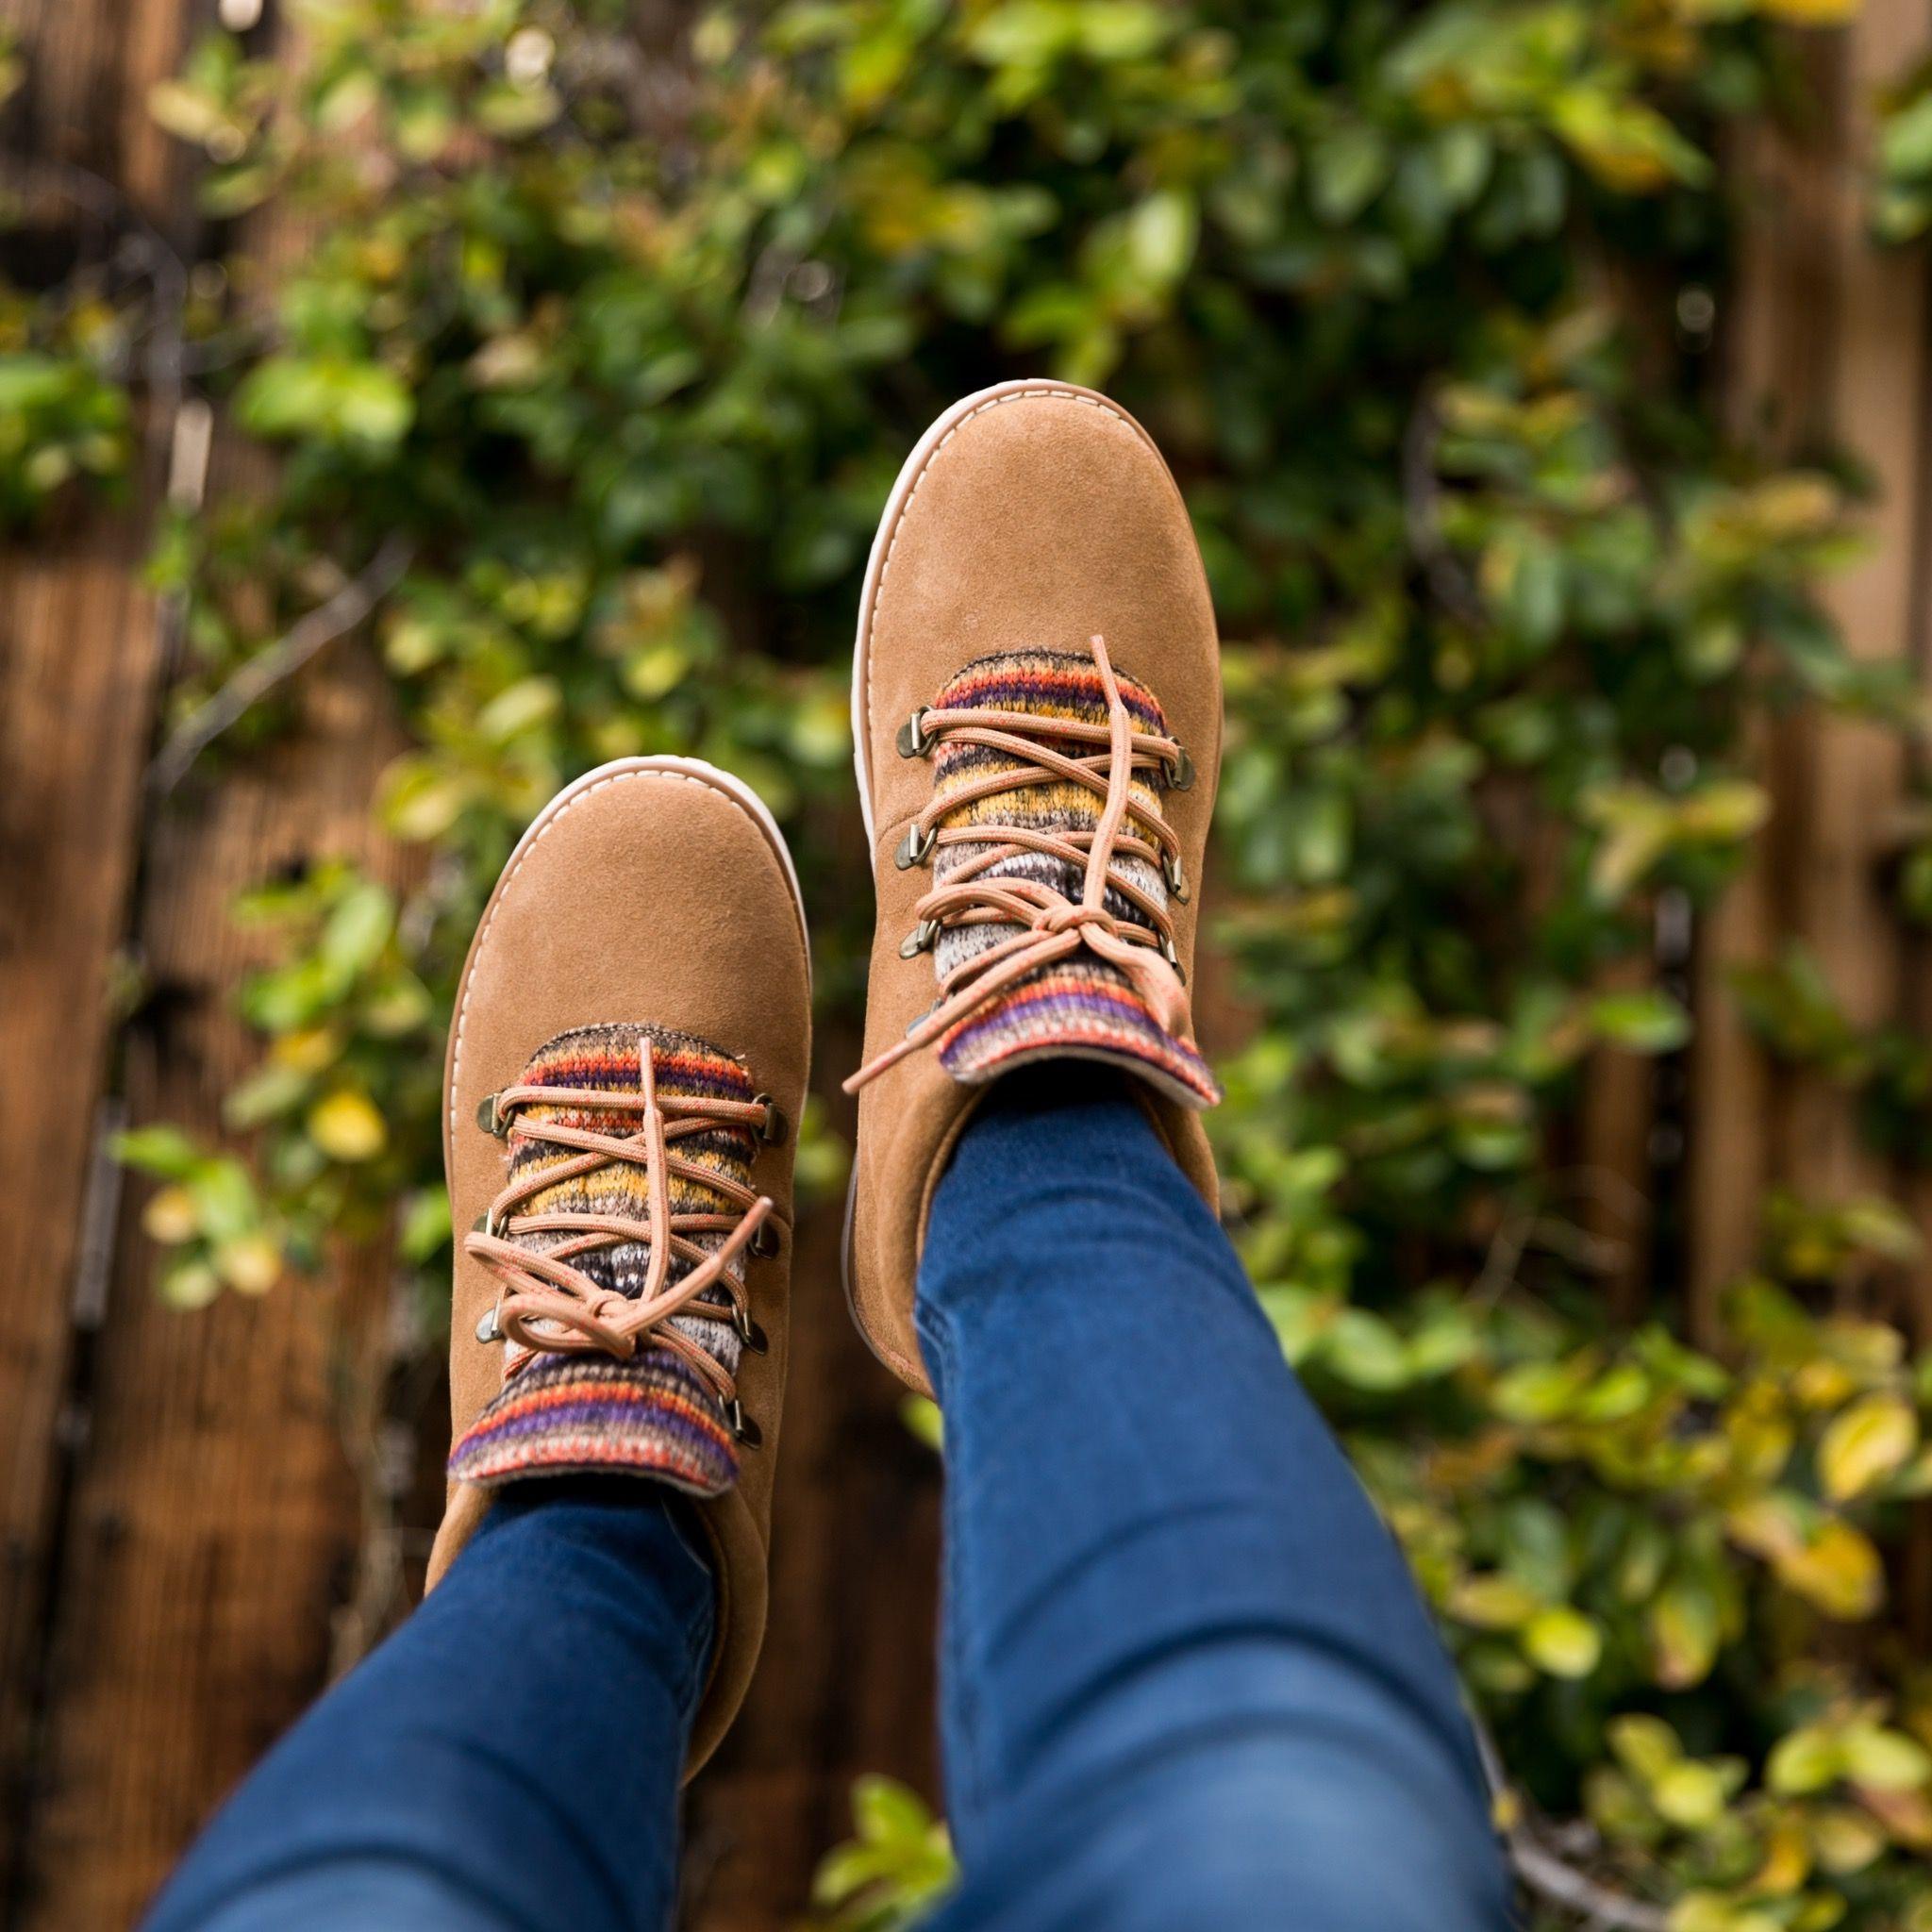 Fall fashion featuring BOBS Alpine boot